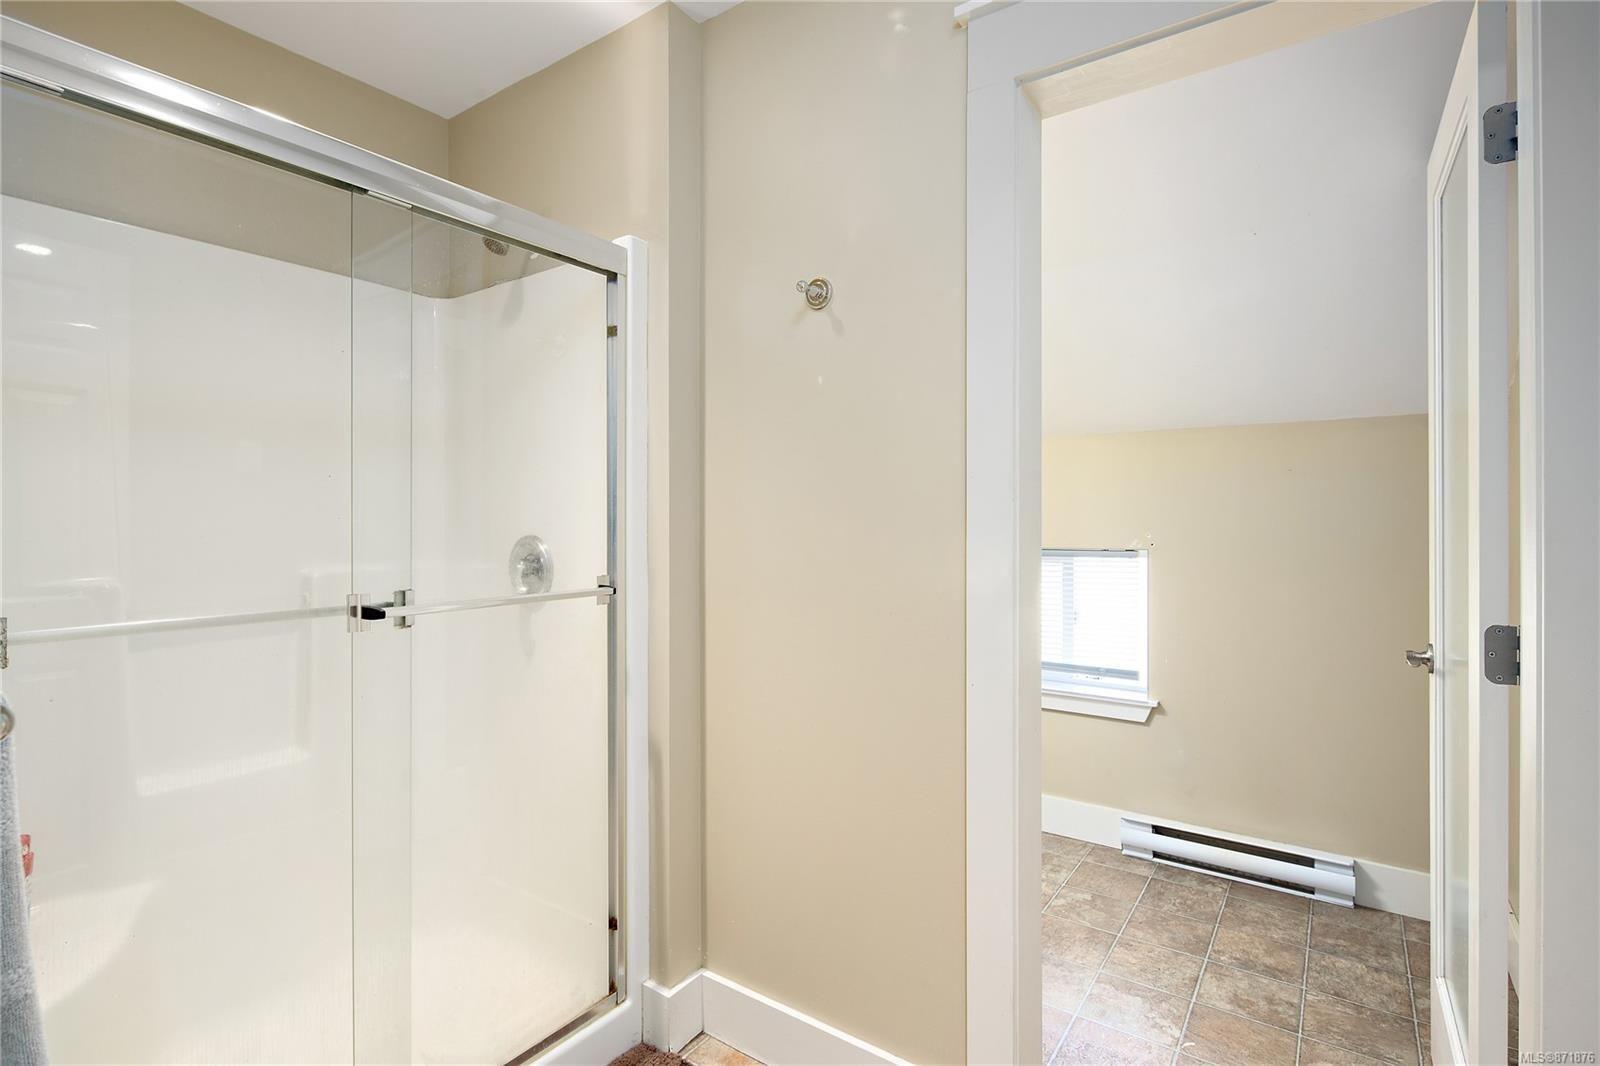 Photo 28: Photos: 4420 Wilkinson Rd in : SW Royal Oak House for sale (Saanich West)  : MLS®# 871876